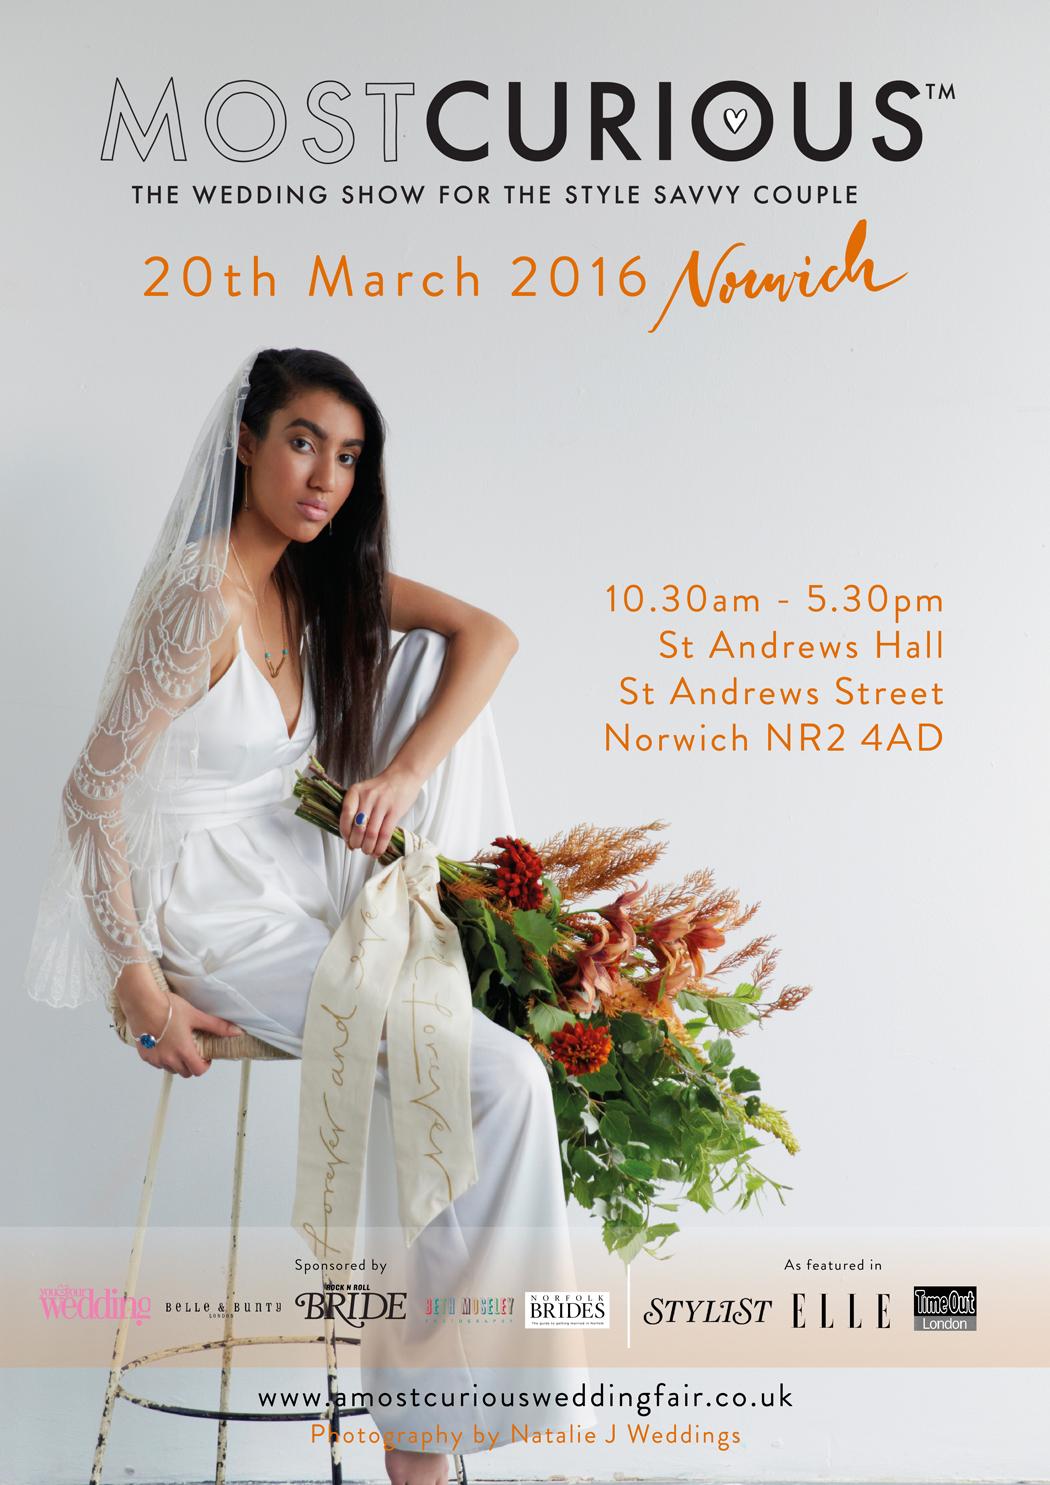 a-most-curious-wedding-fair-norwich-march-2016